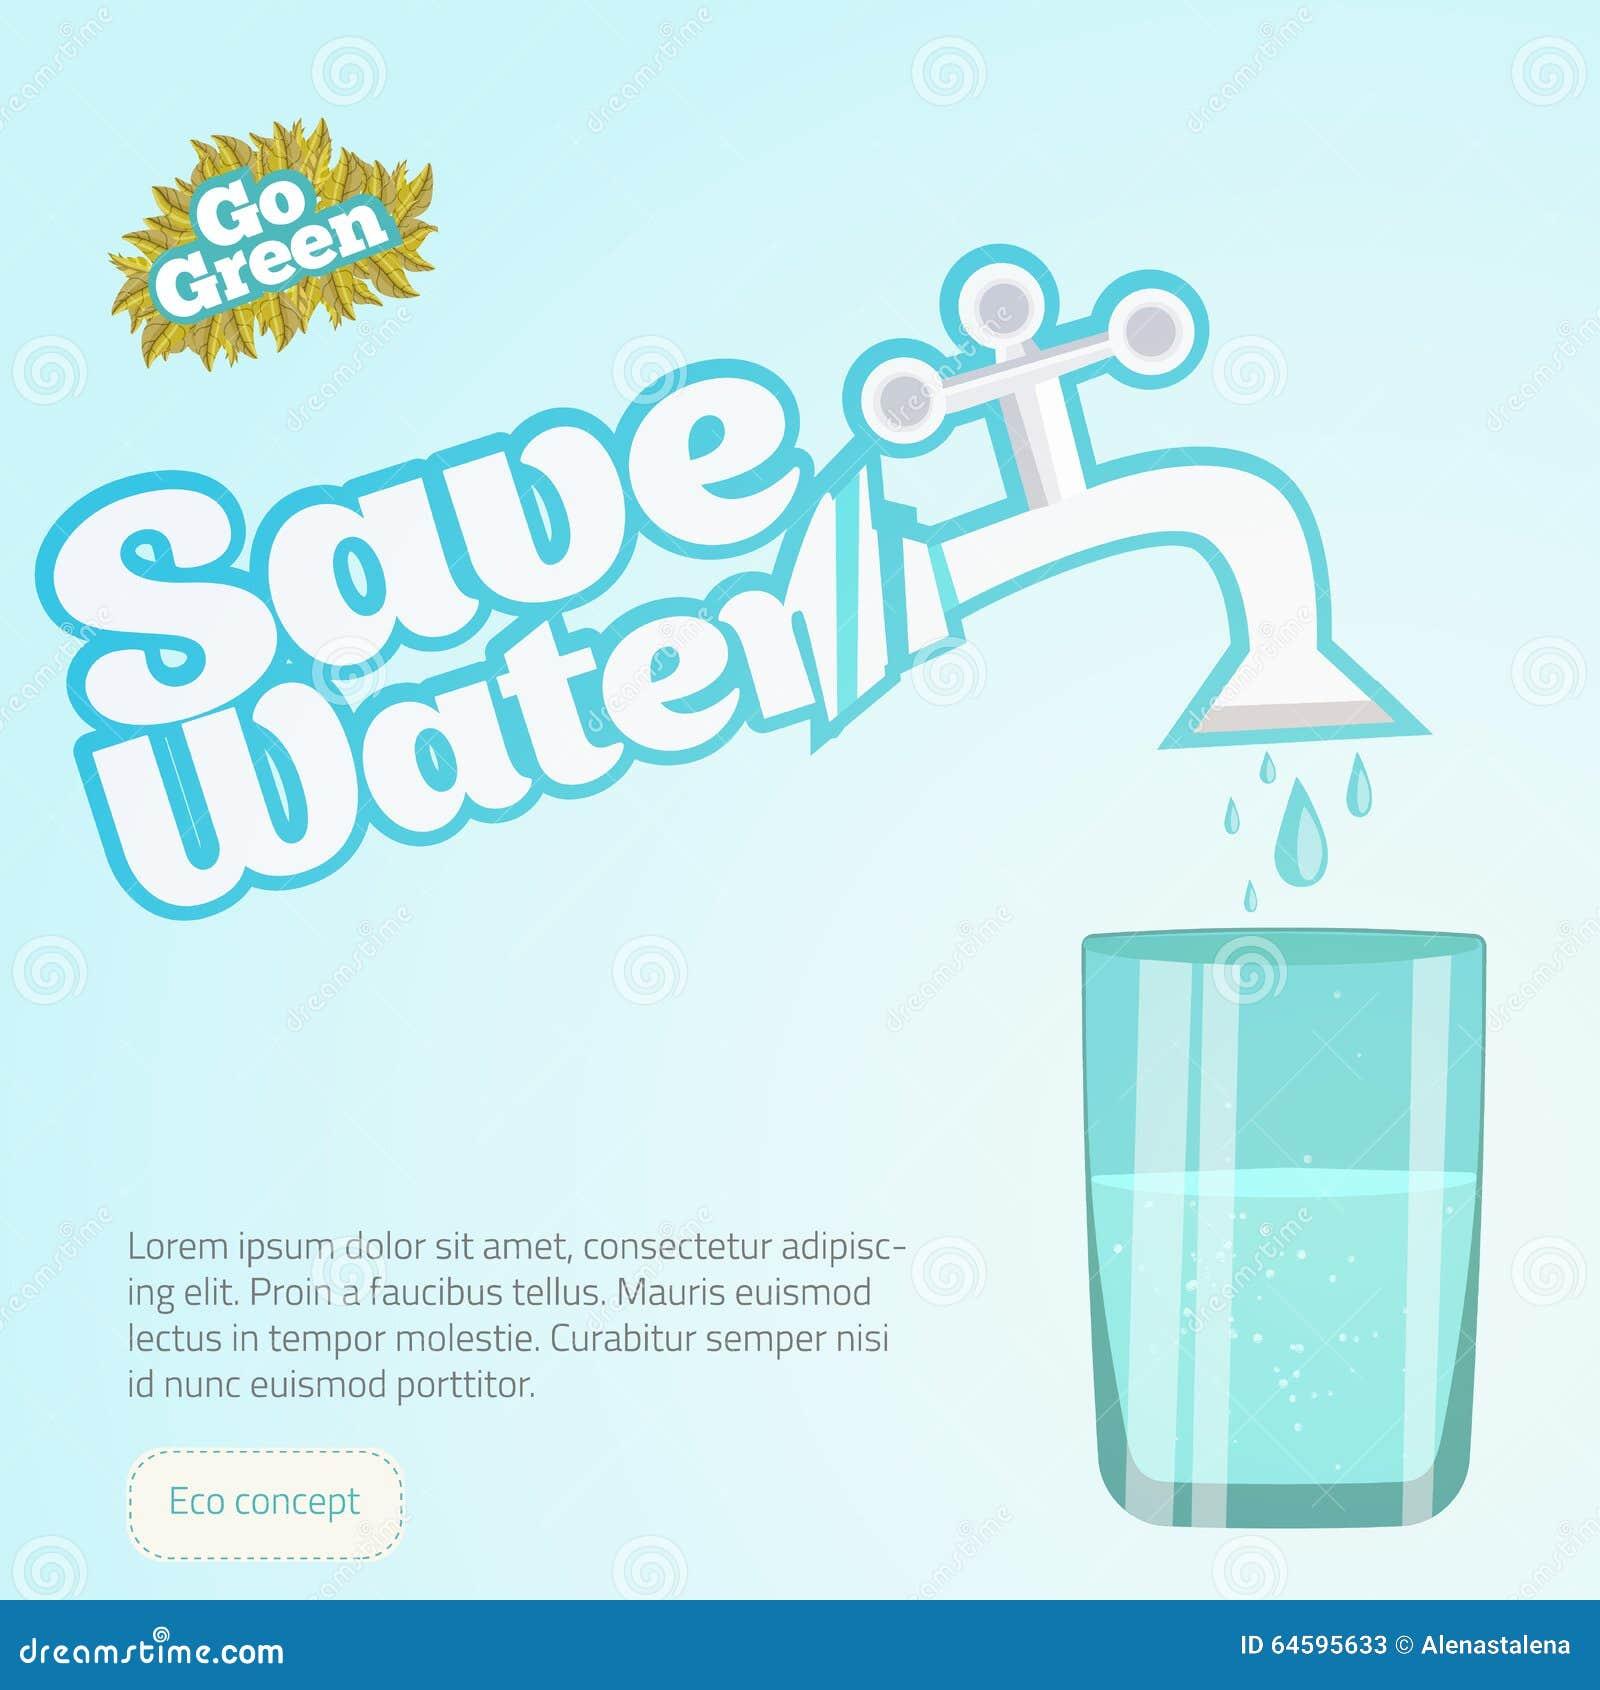 cant save pdf on illustration